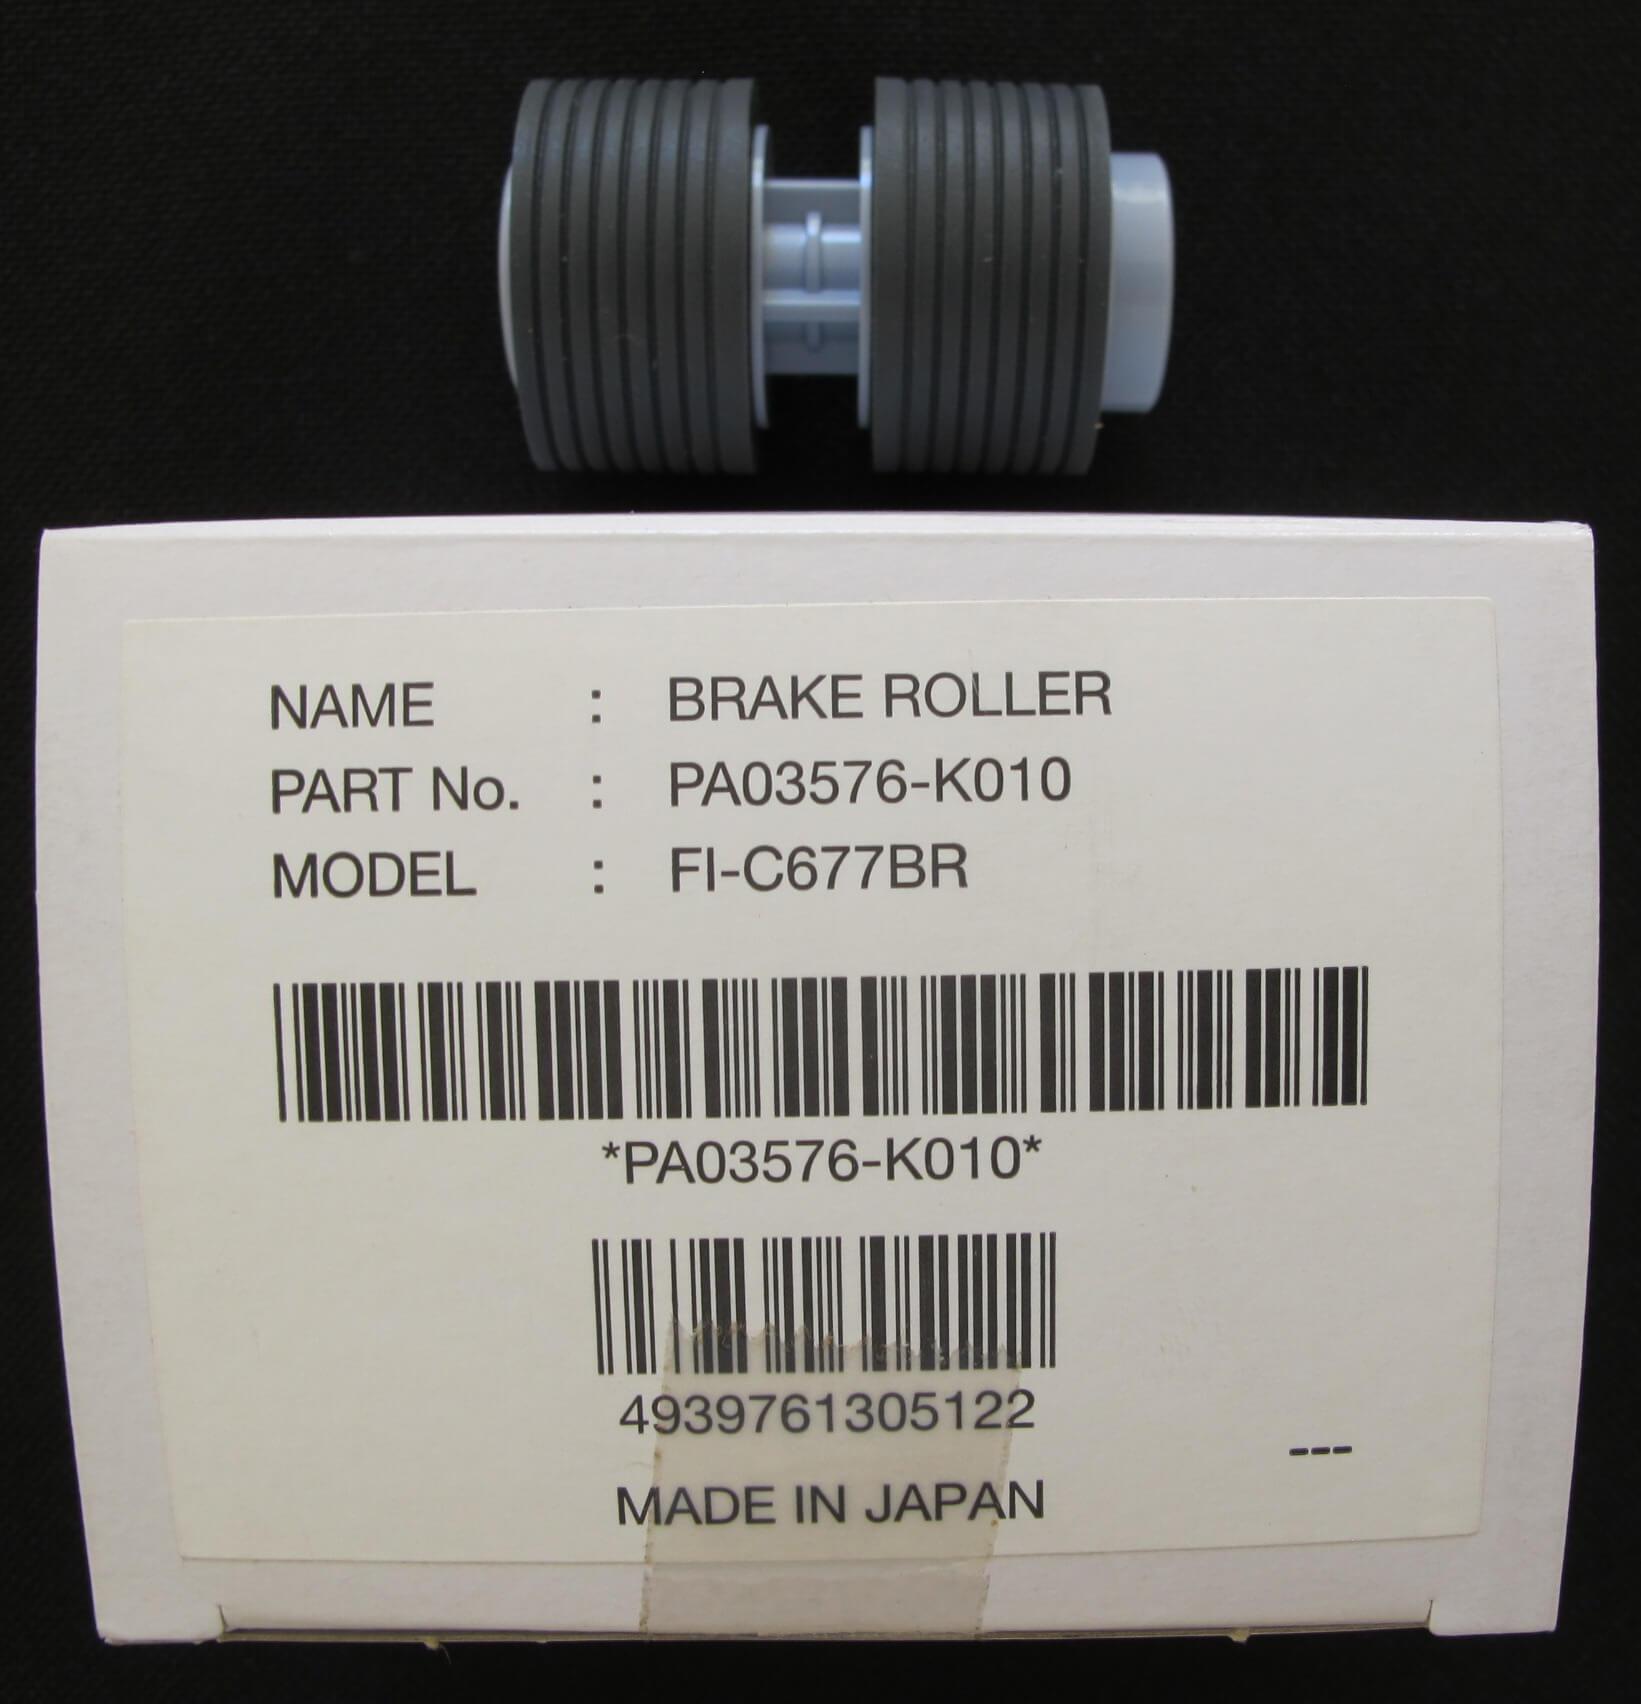 kit manutenção scanner Fujitsu fi-6670 e fi6770 brake roller PN: PA03576-K010 com caixa